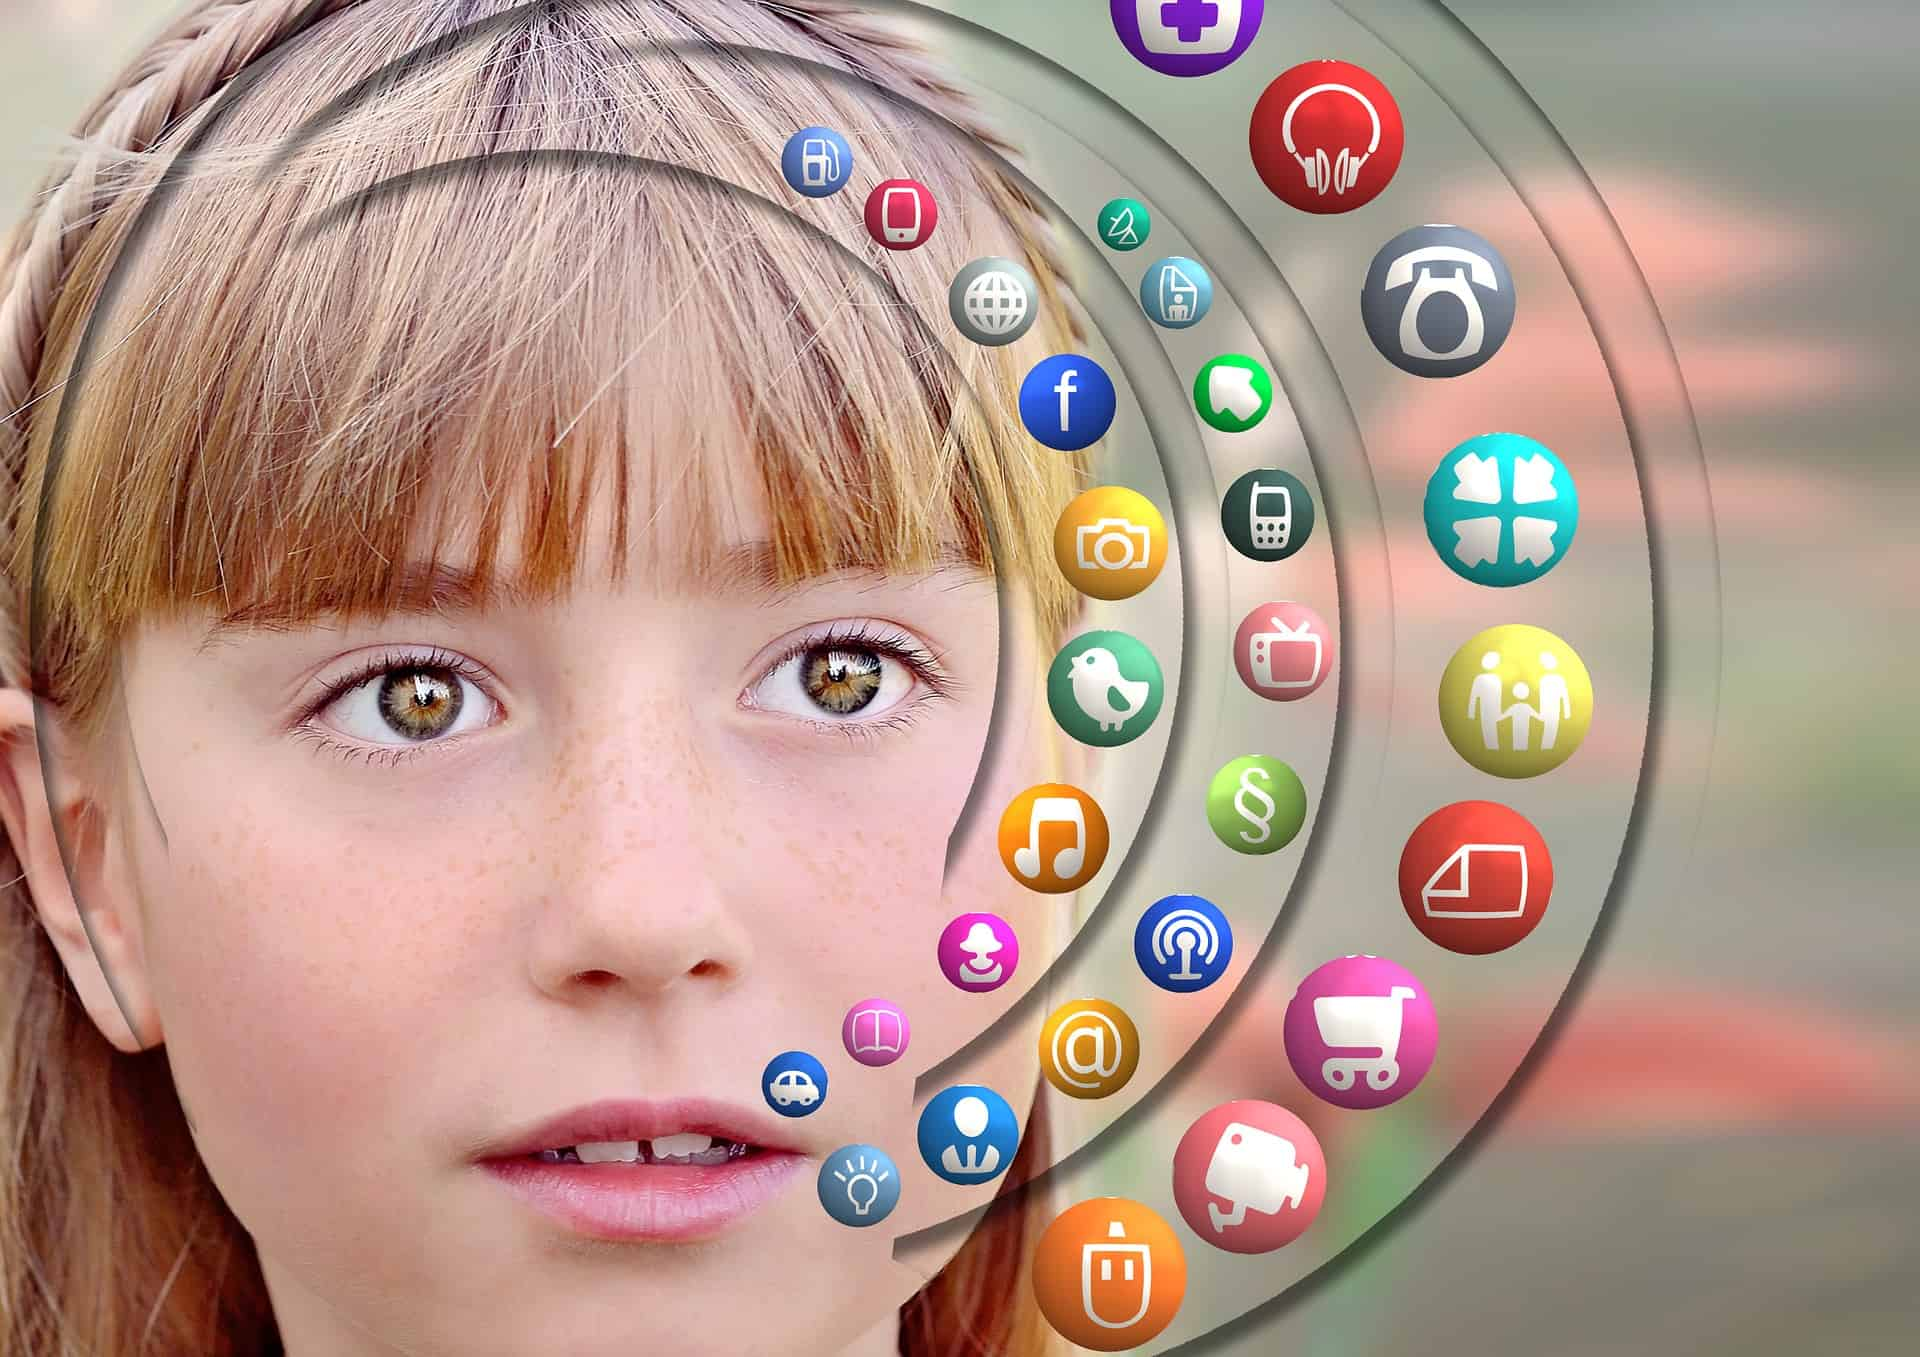 Internet Era: the problem of self-diagnosing